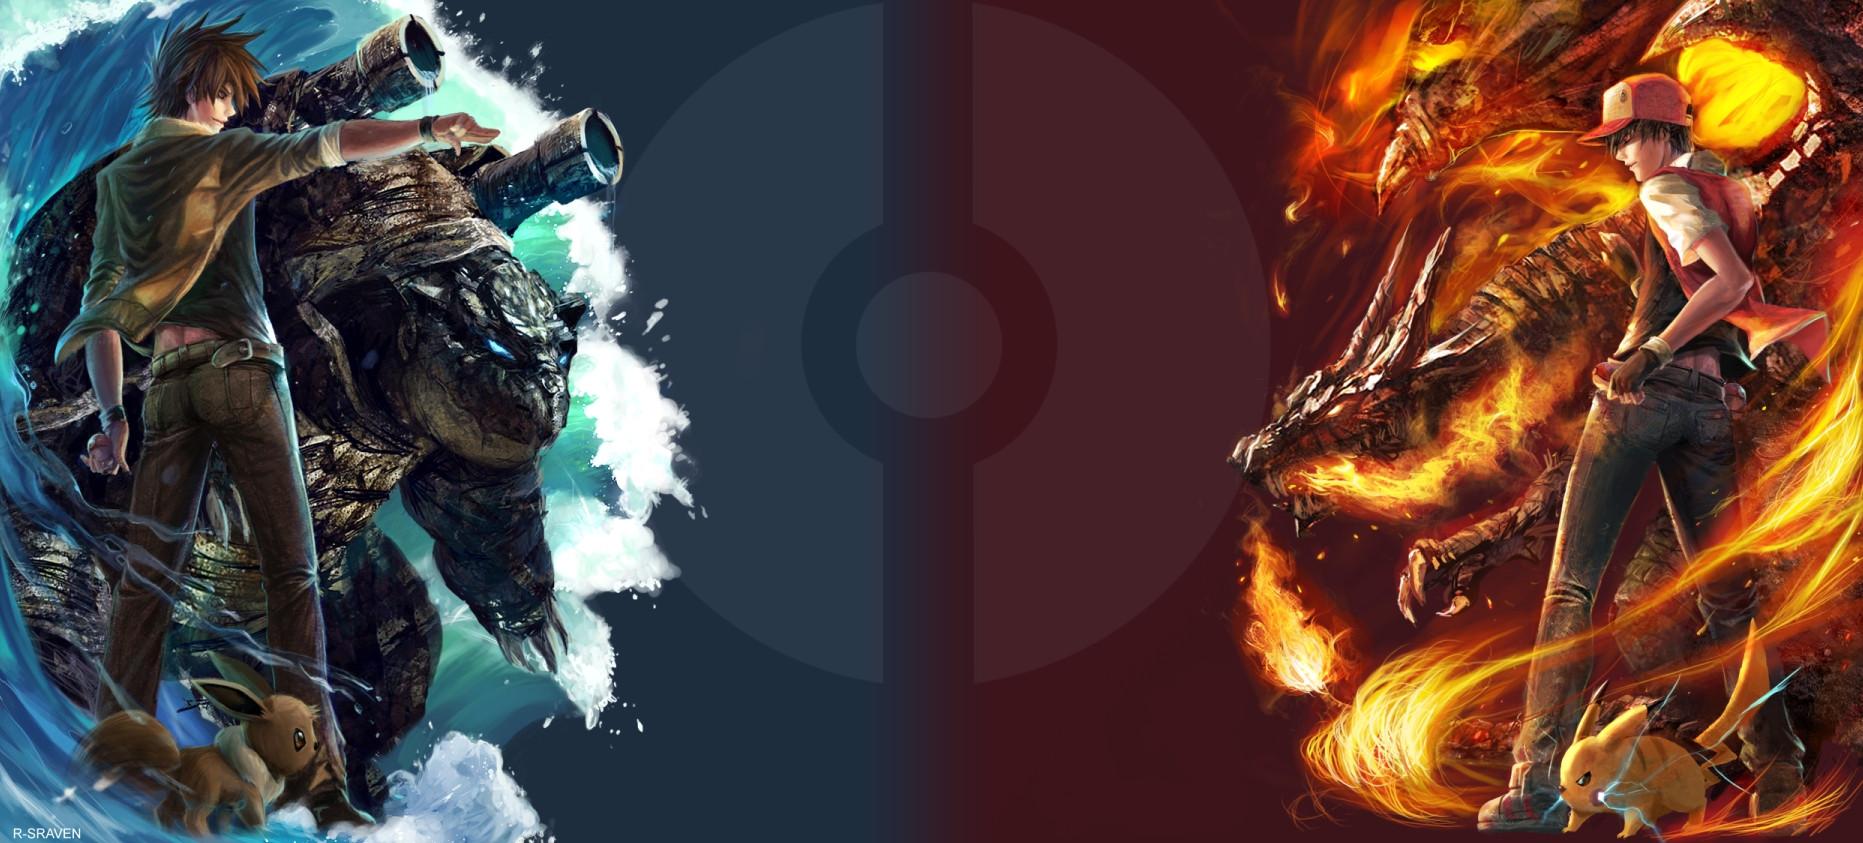 Blastoise vs Charizard [X post from rWallpaper] pokemon 1863x843